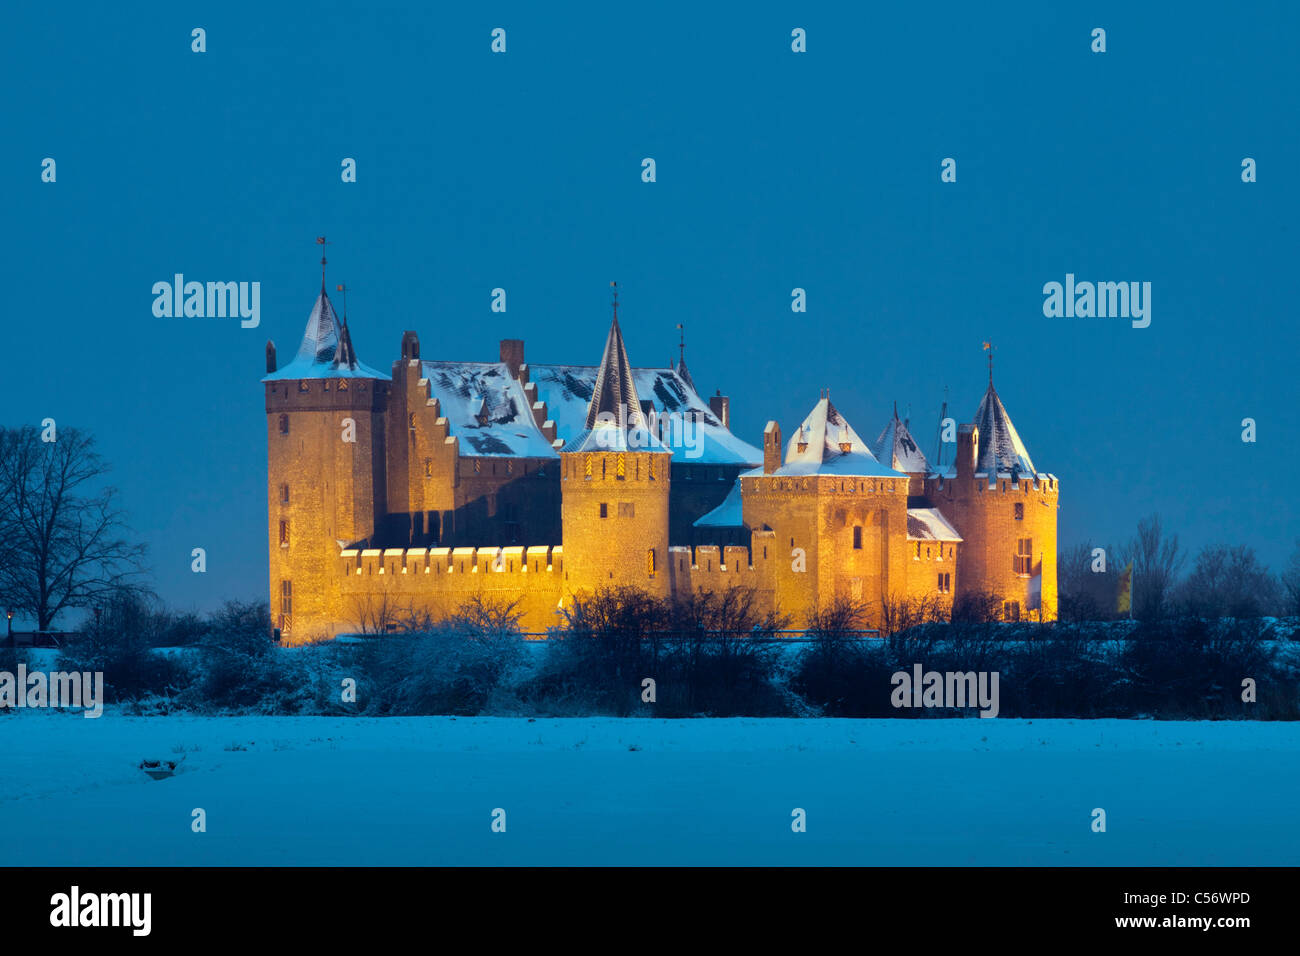 The Netherlands, Muiden, Castle called Muiderslot. Winter, snow. - Stock Image